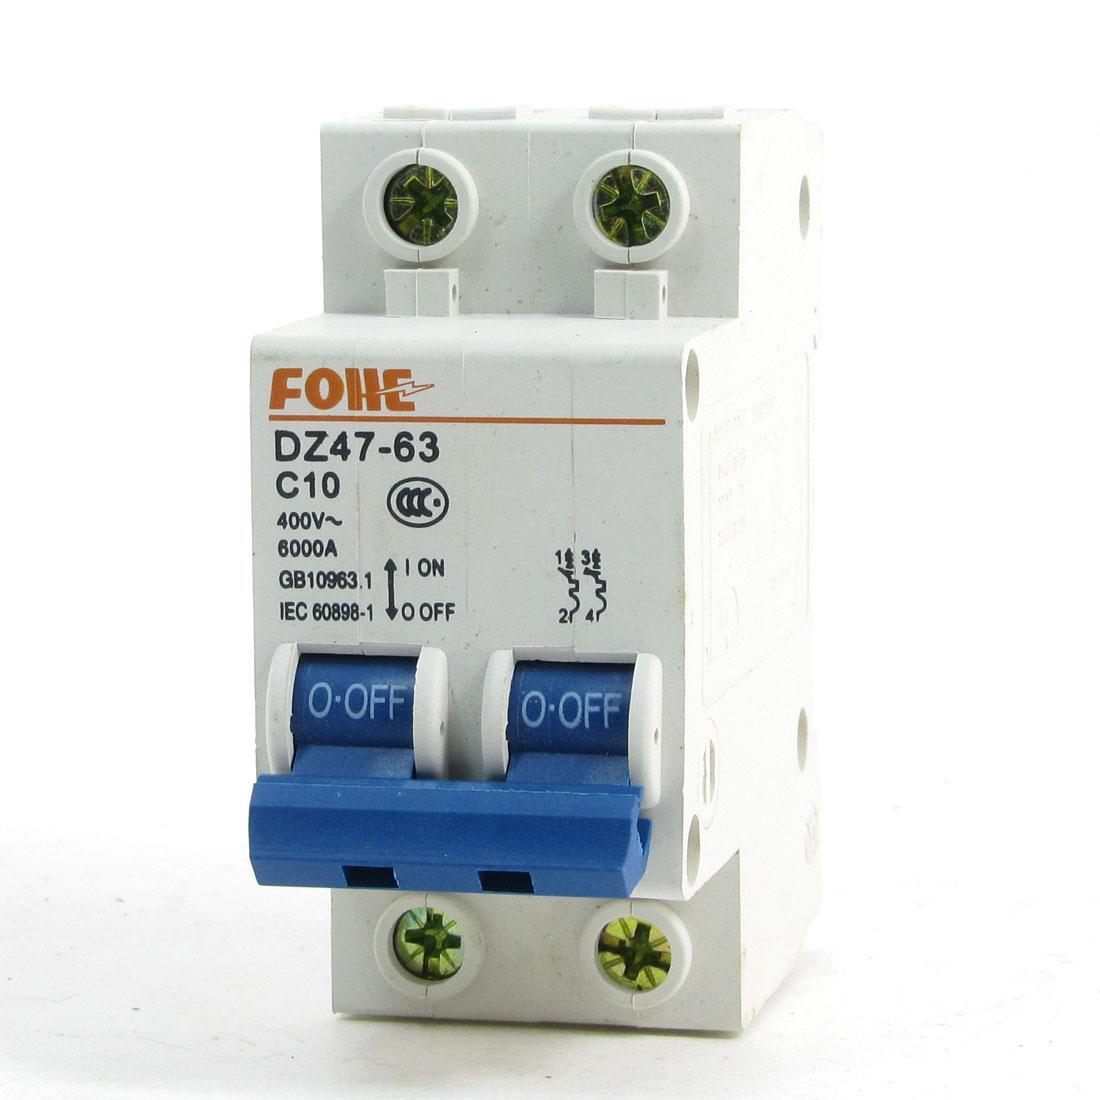 DIN Rail 2 Pole Short Circuit Protector Breaker DZ47-63 400V 10A 6000A